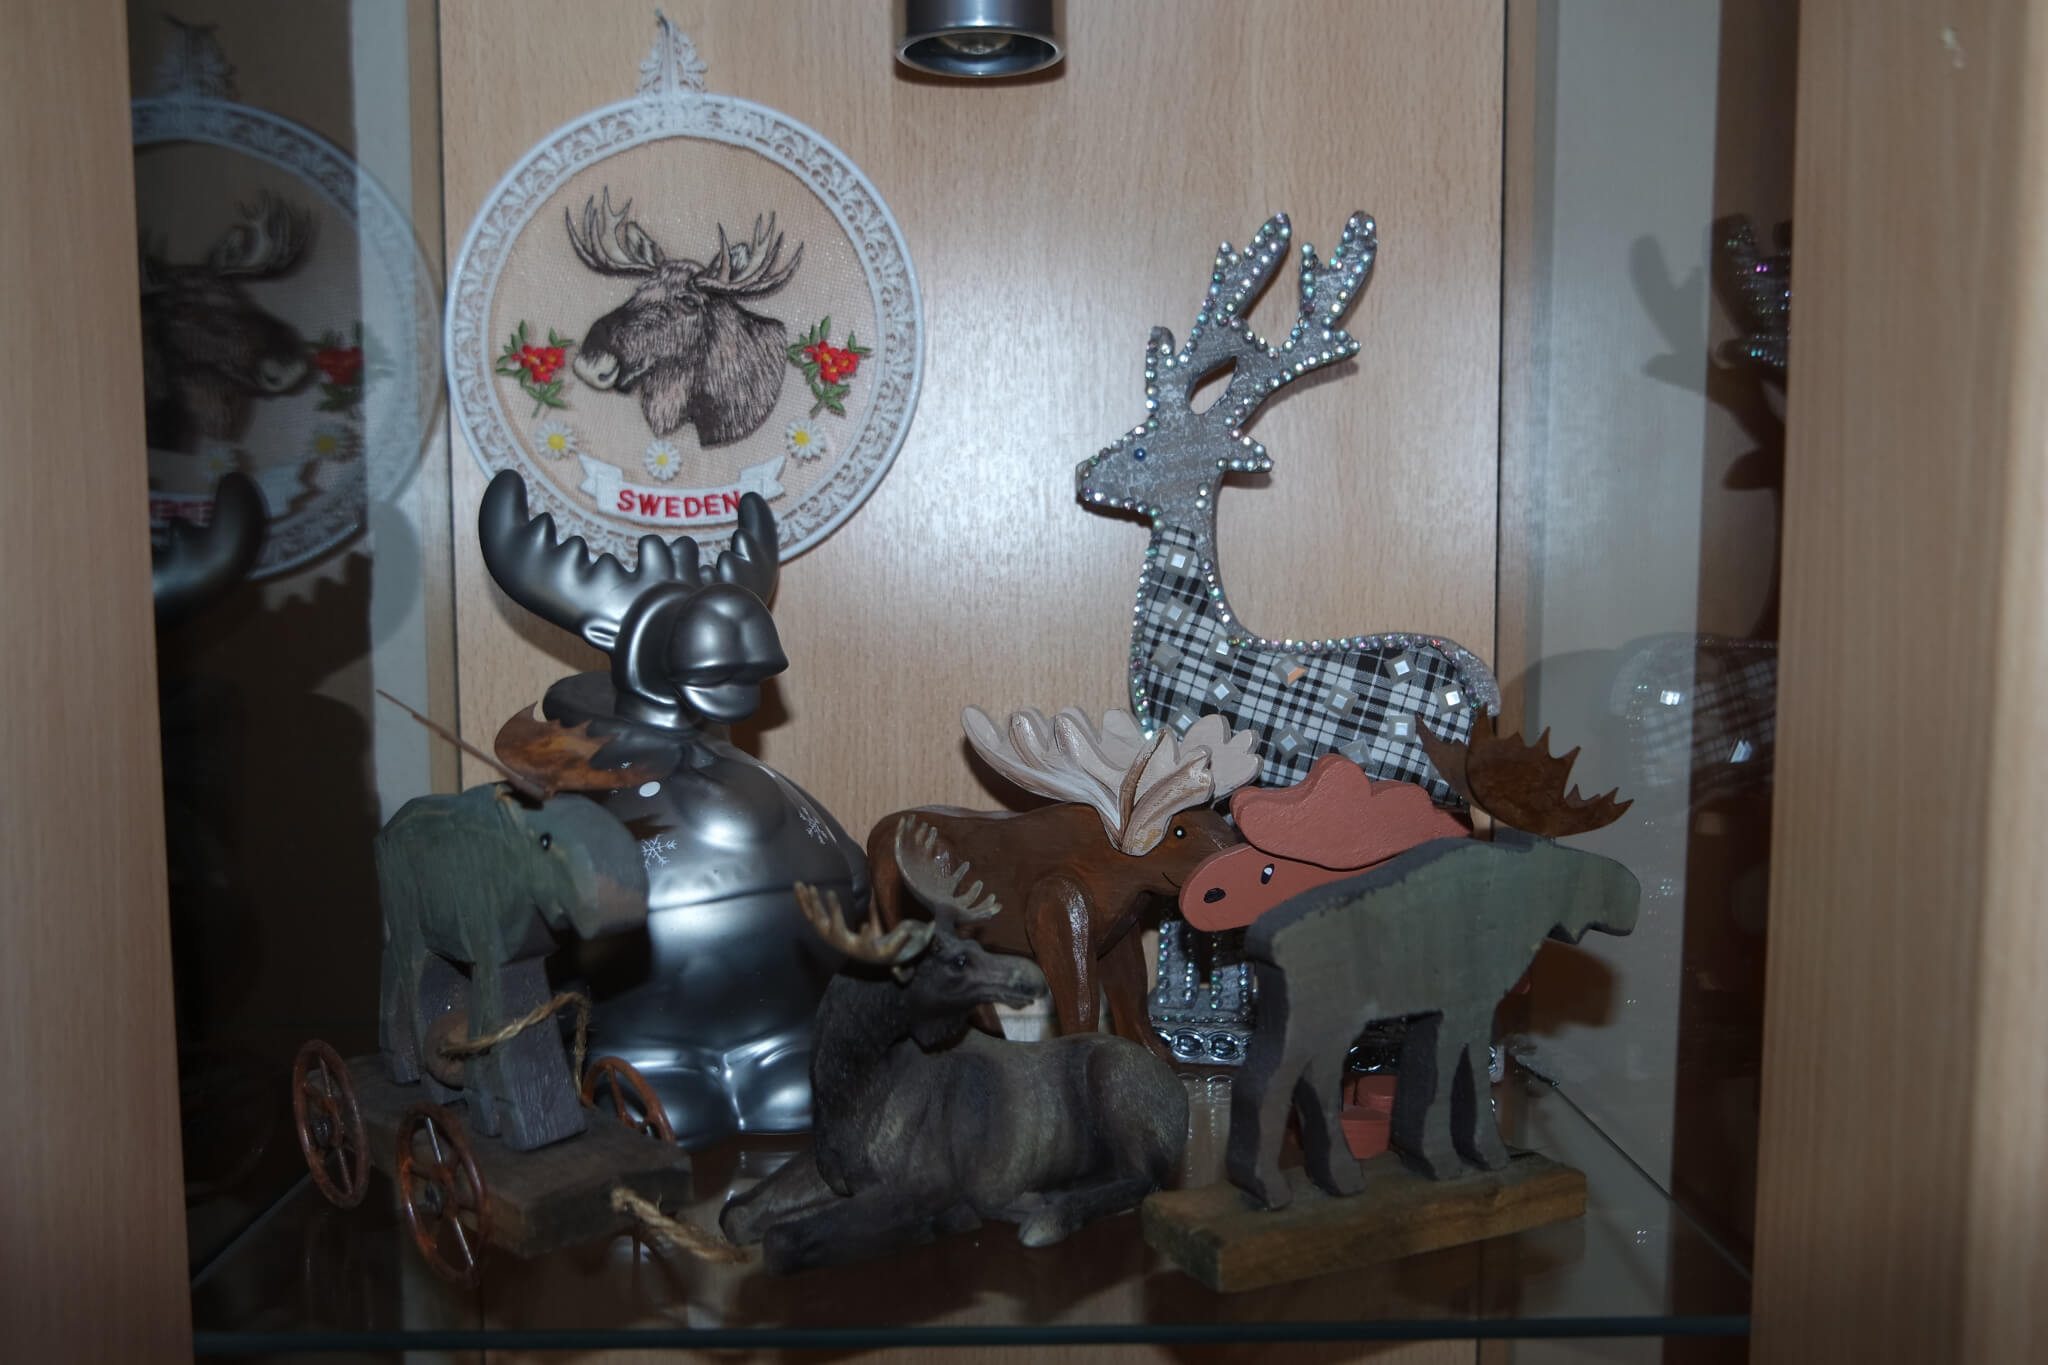 Große Sammlung verschiedener Elchfiguren